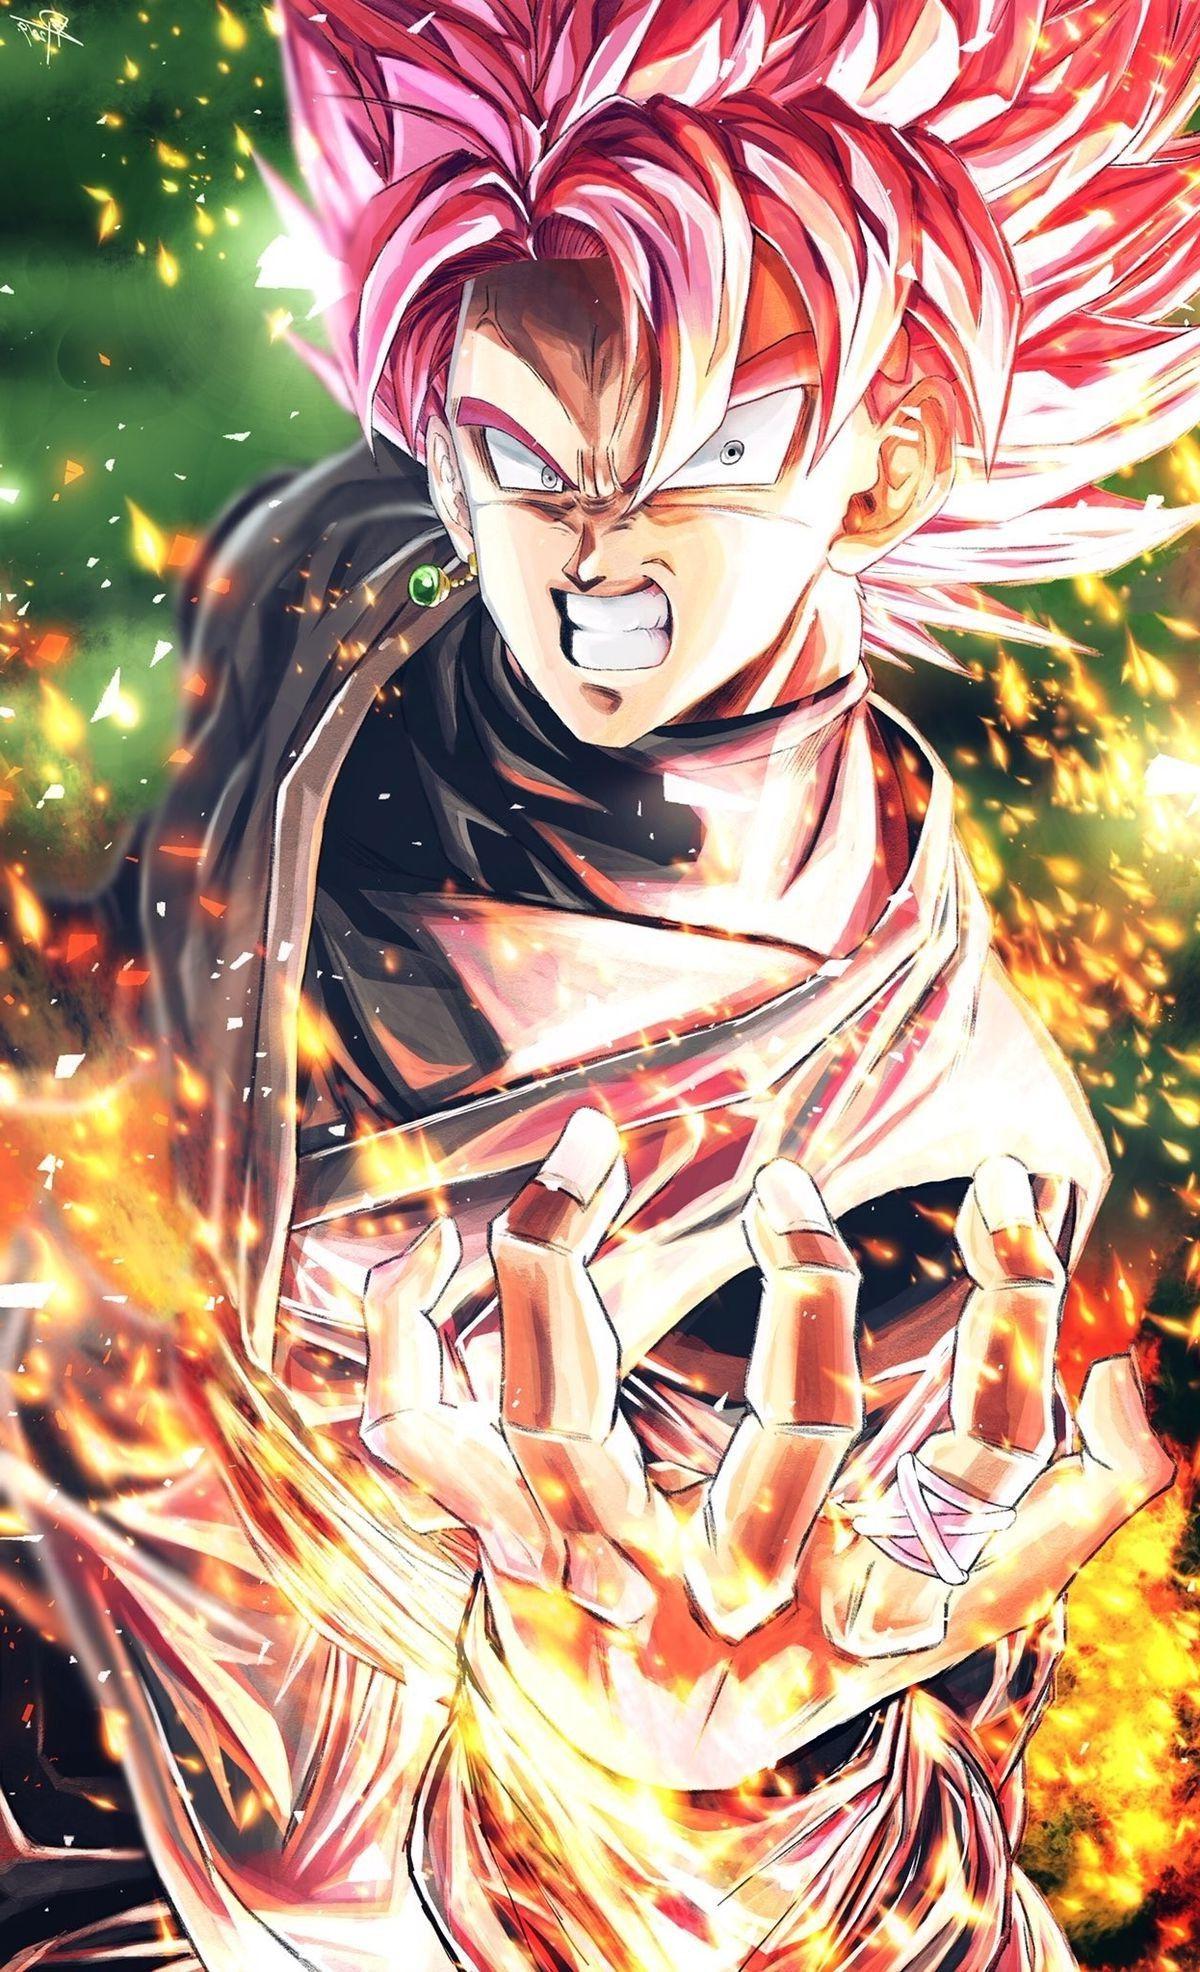 Iphone X Xr Xs 6 7 8 Plus Soft Tpu Case Cover Goku Black Rose Dragon Ball Goku Anime Dragon Ball Super Dragon Ball Super Manga